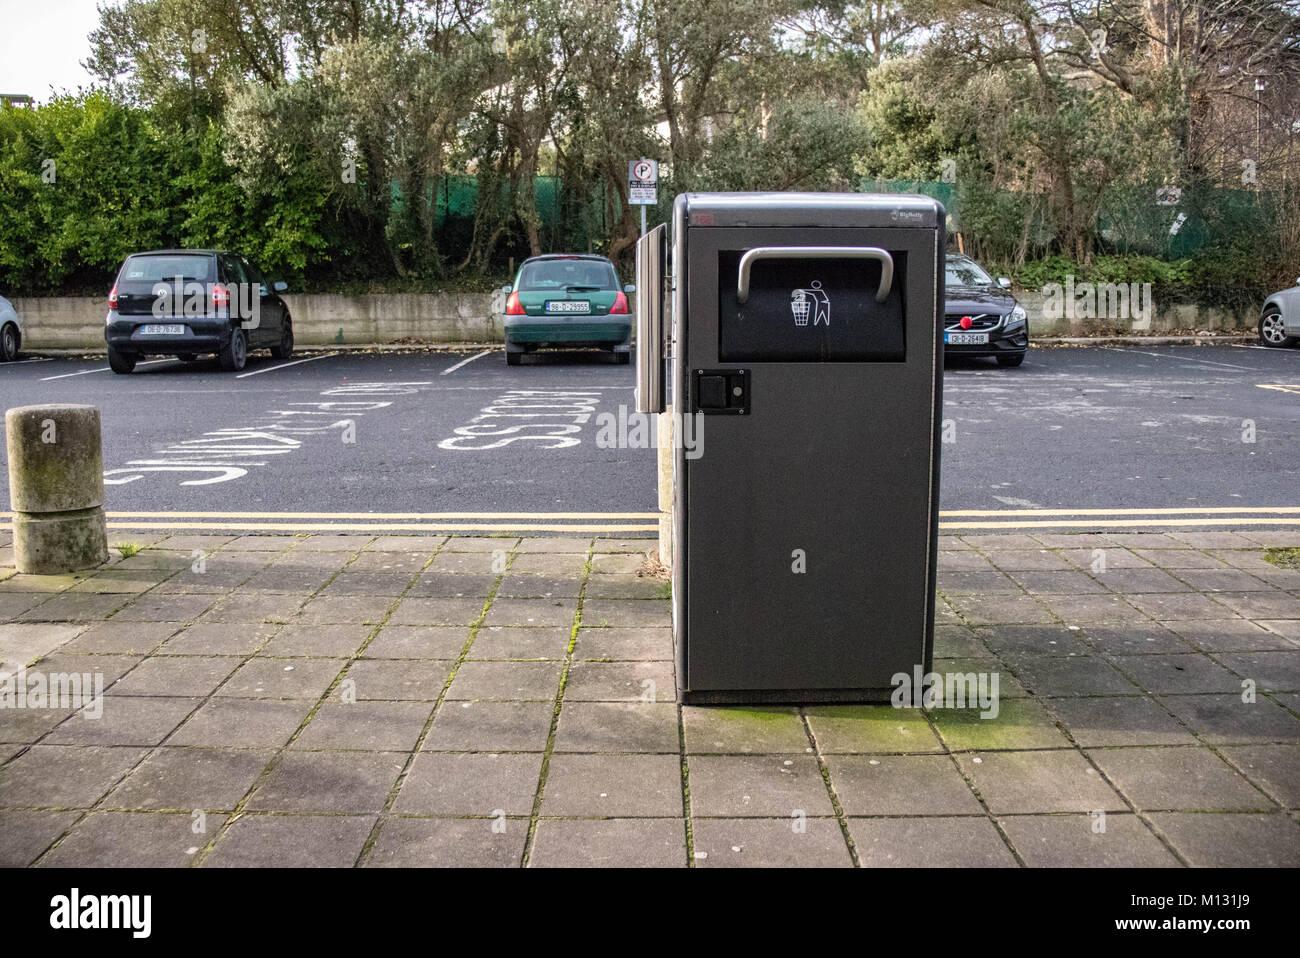 A Rubbish Bin in Dublin - Stock Image